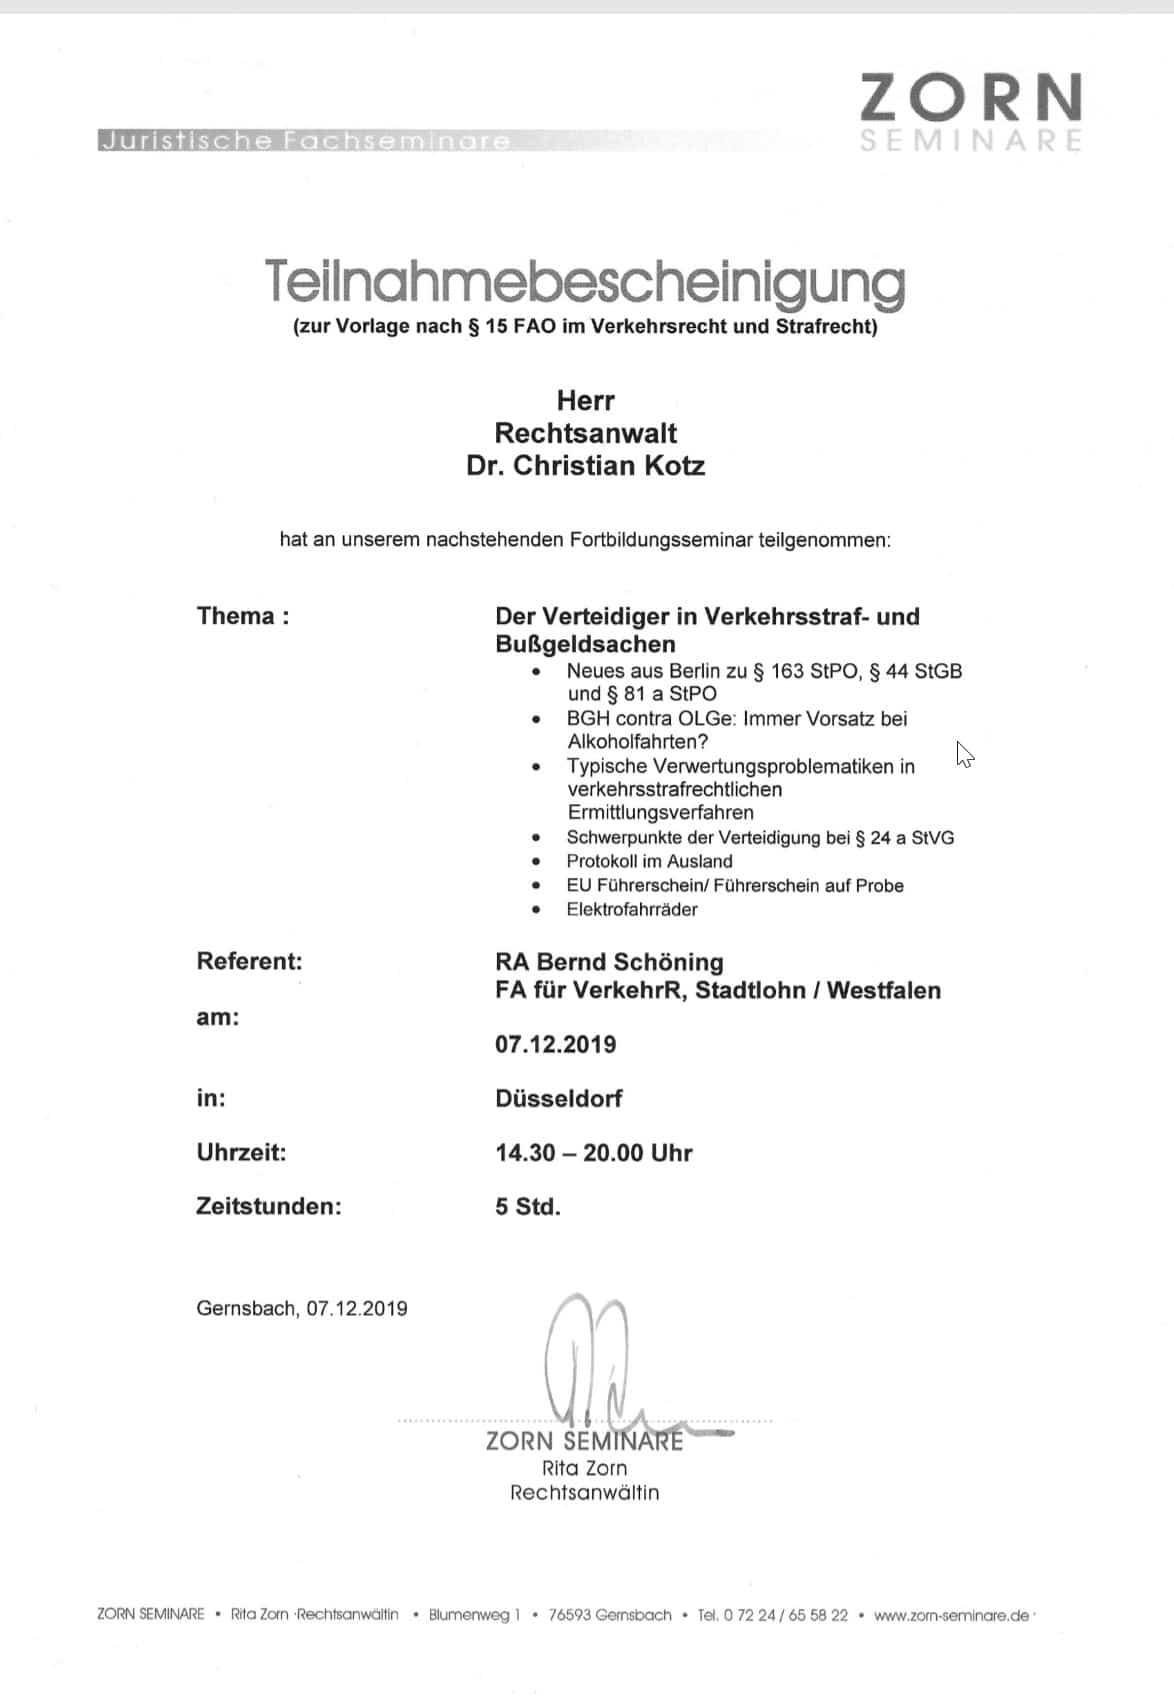 zornseminare-07-12-2019